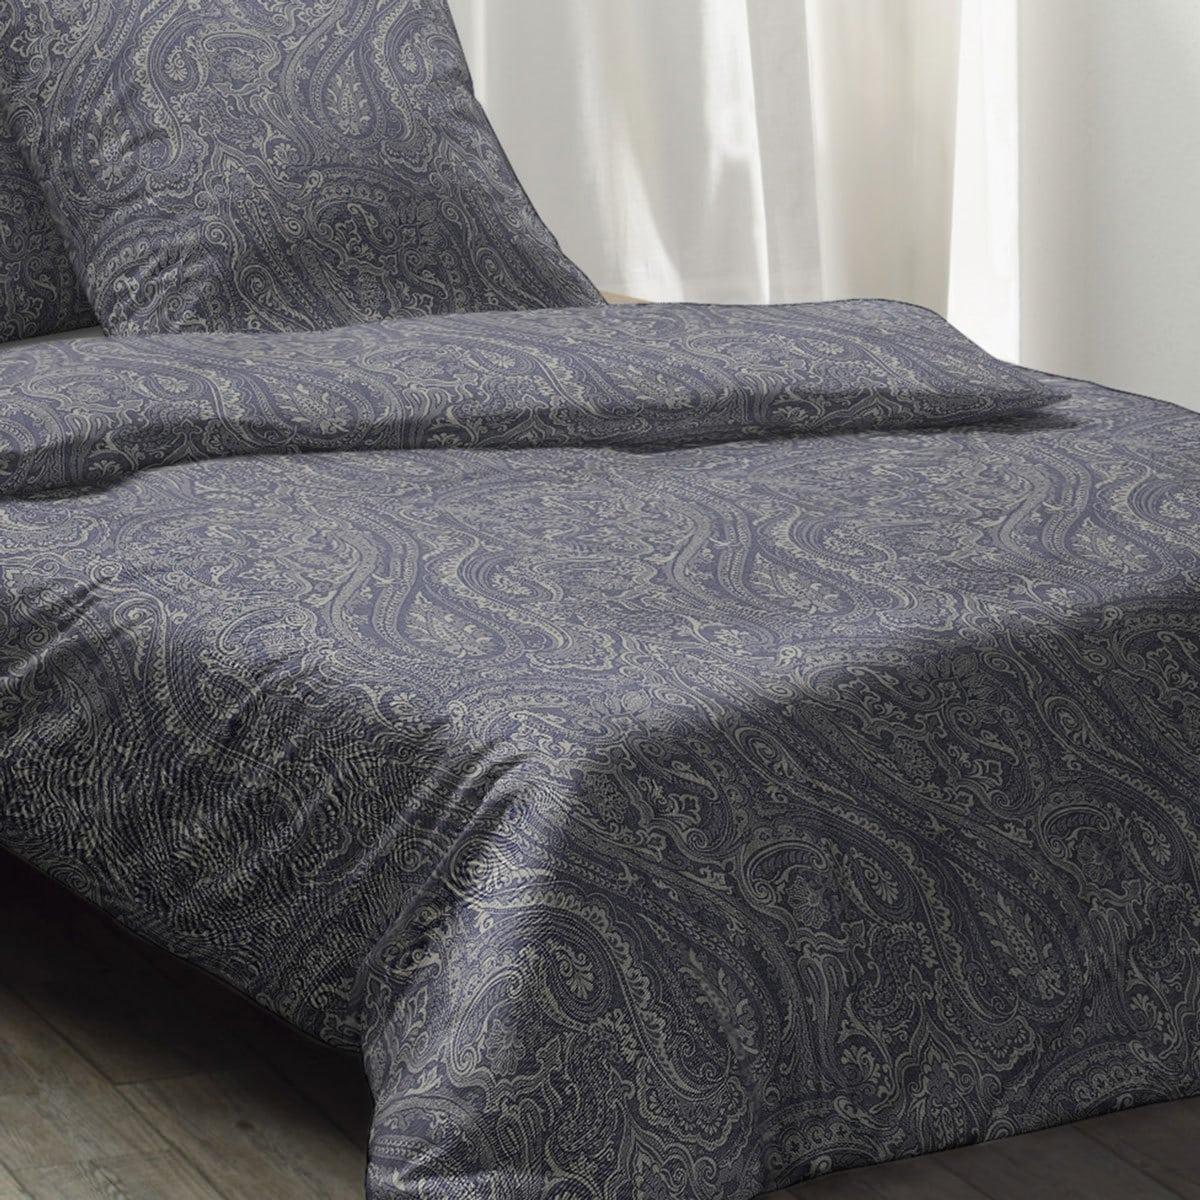 fleuresse edelflanell bettw sche paisley 603868 02 marine. Black Bedroom Furniture Sets. Home Design Ideas